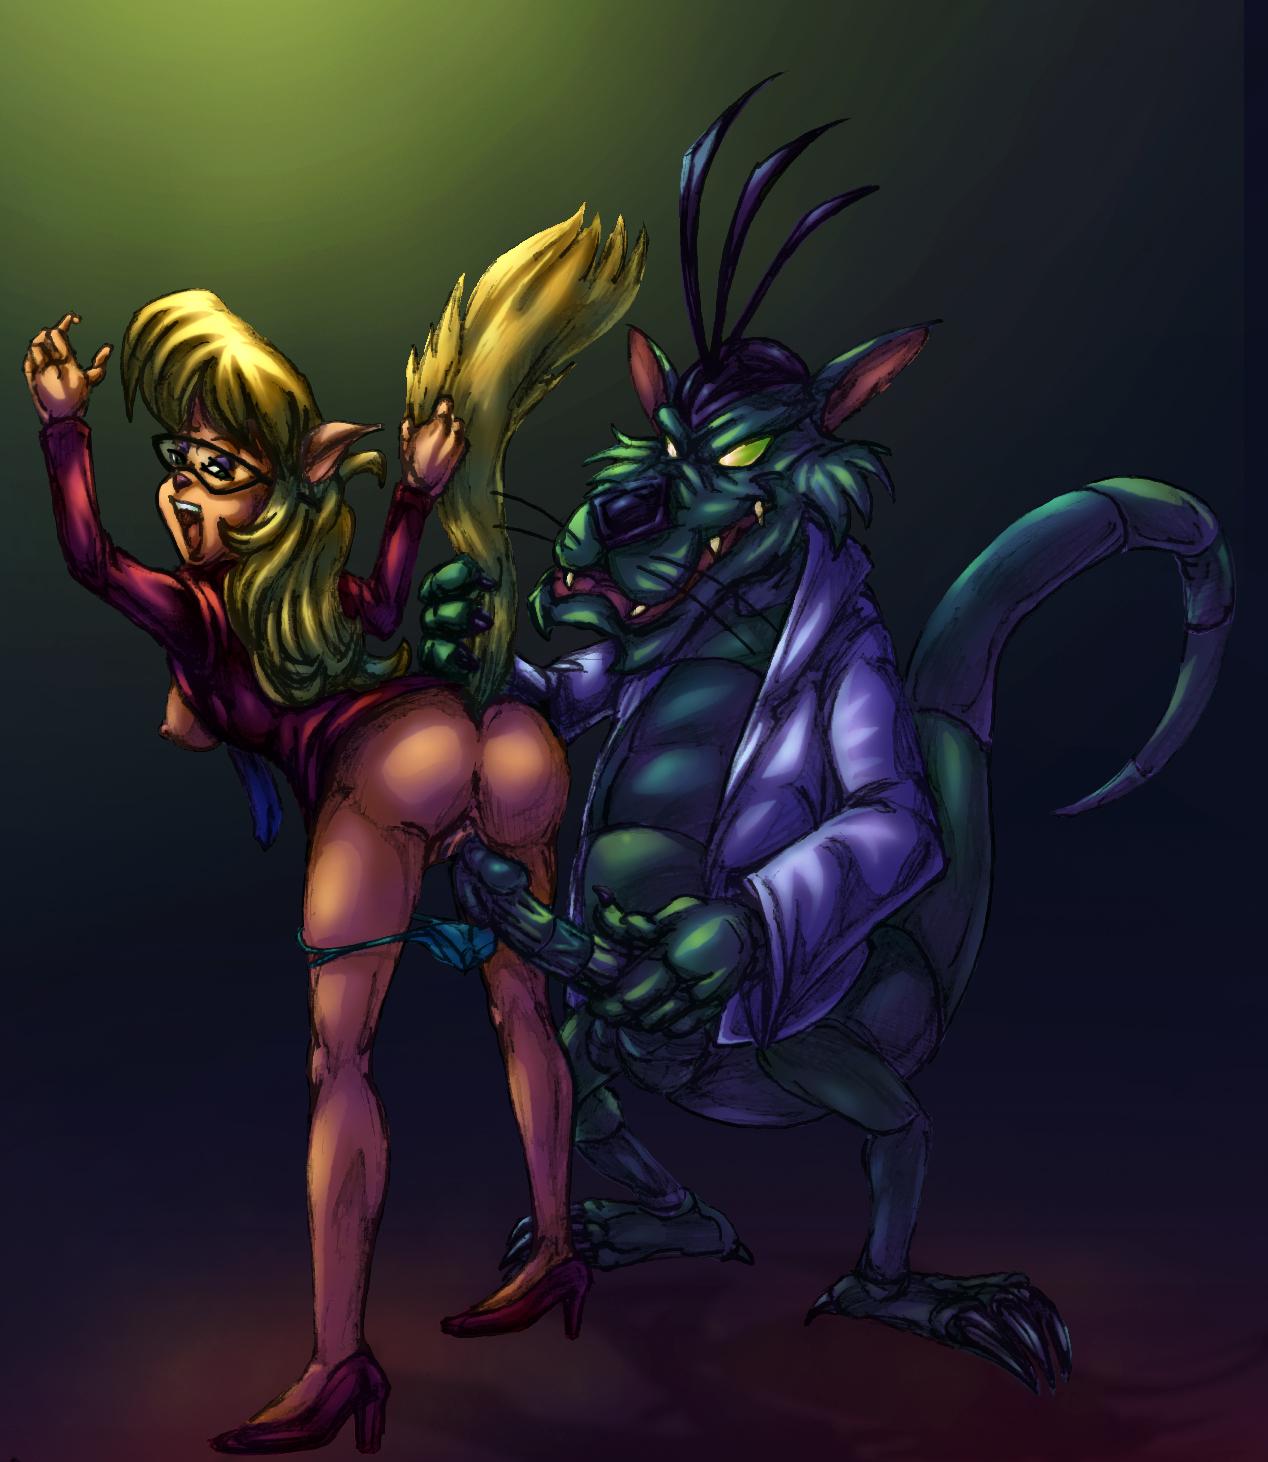 from kats callie swat briggs Elvira mistress of the dark xxx